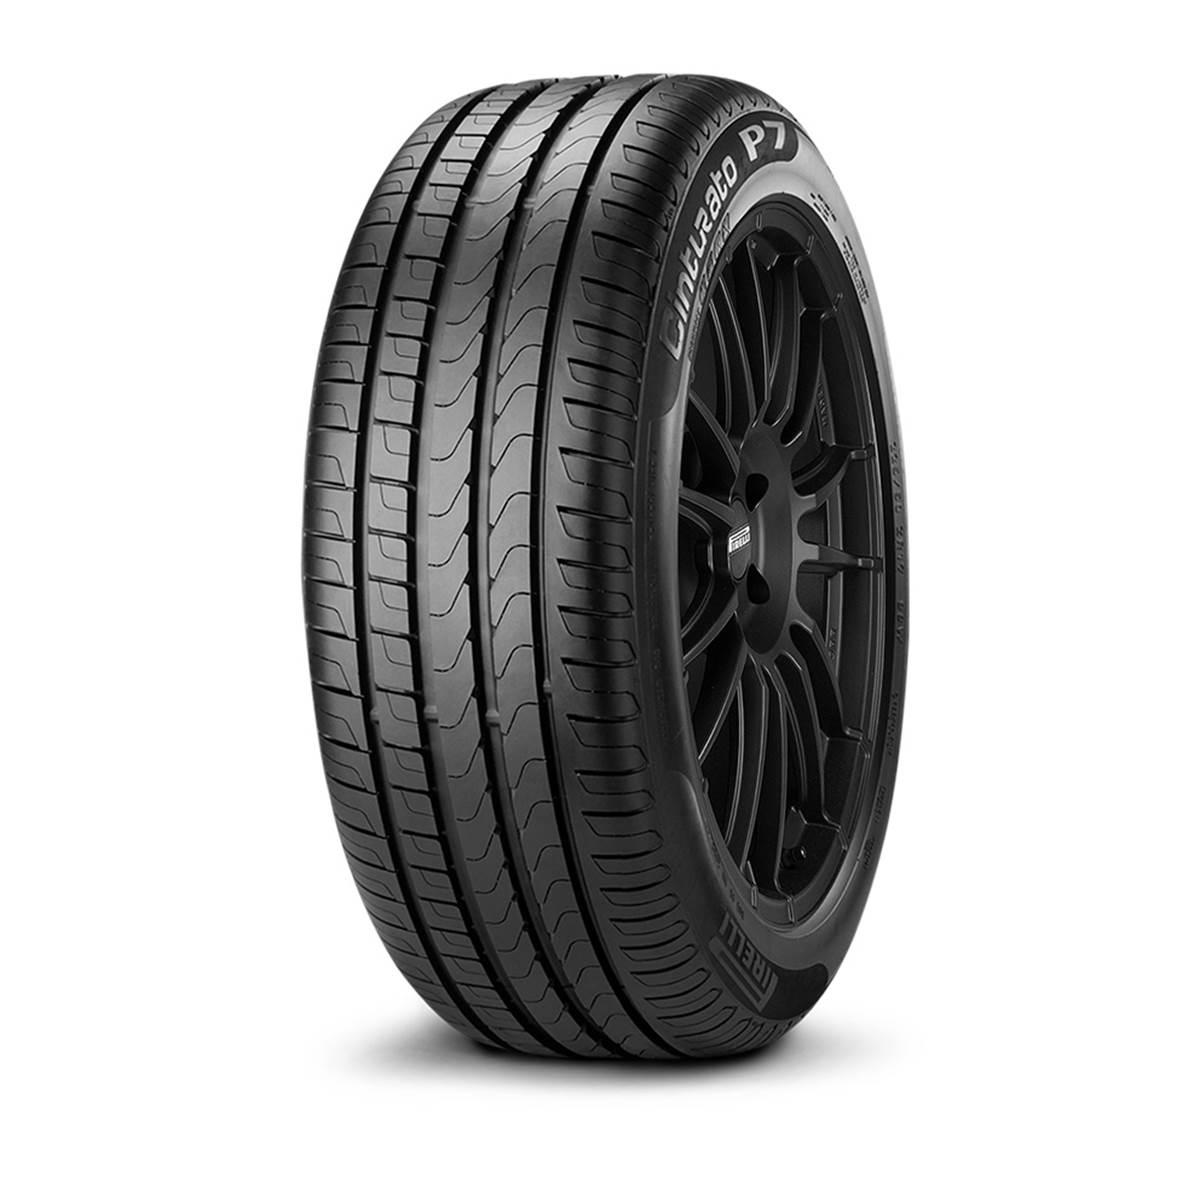 Pirelli Cinturato P7 Homologue Audi